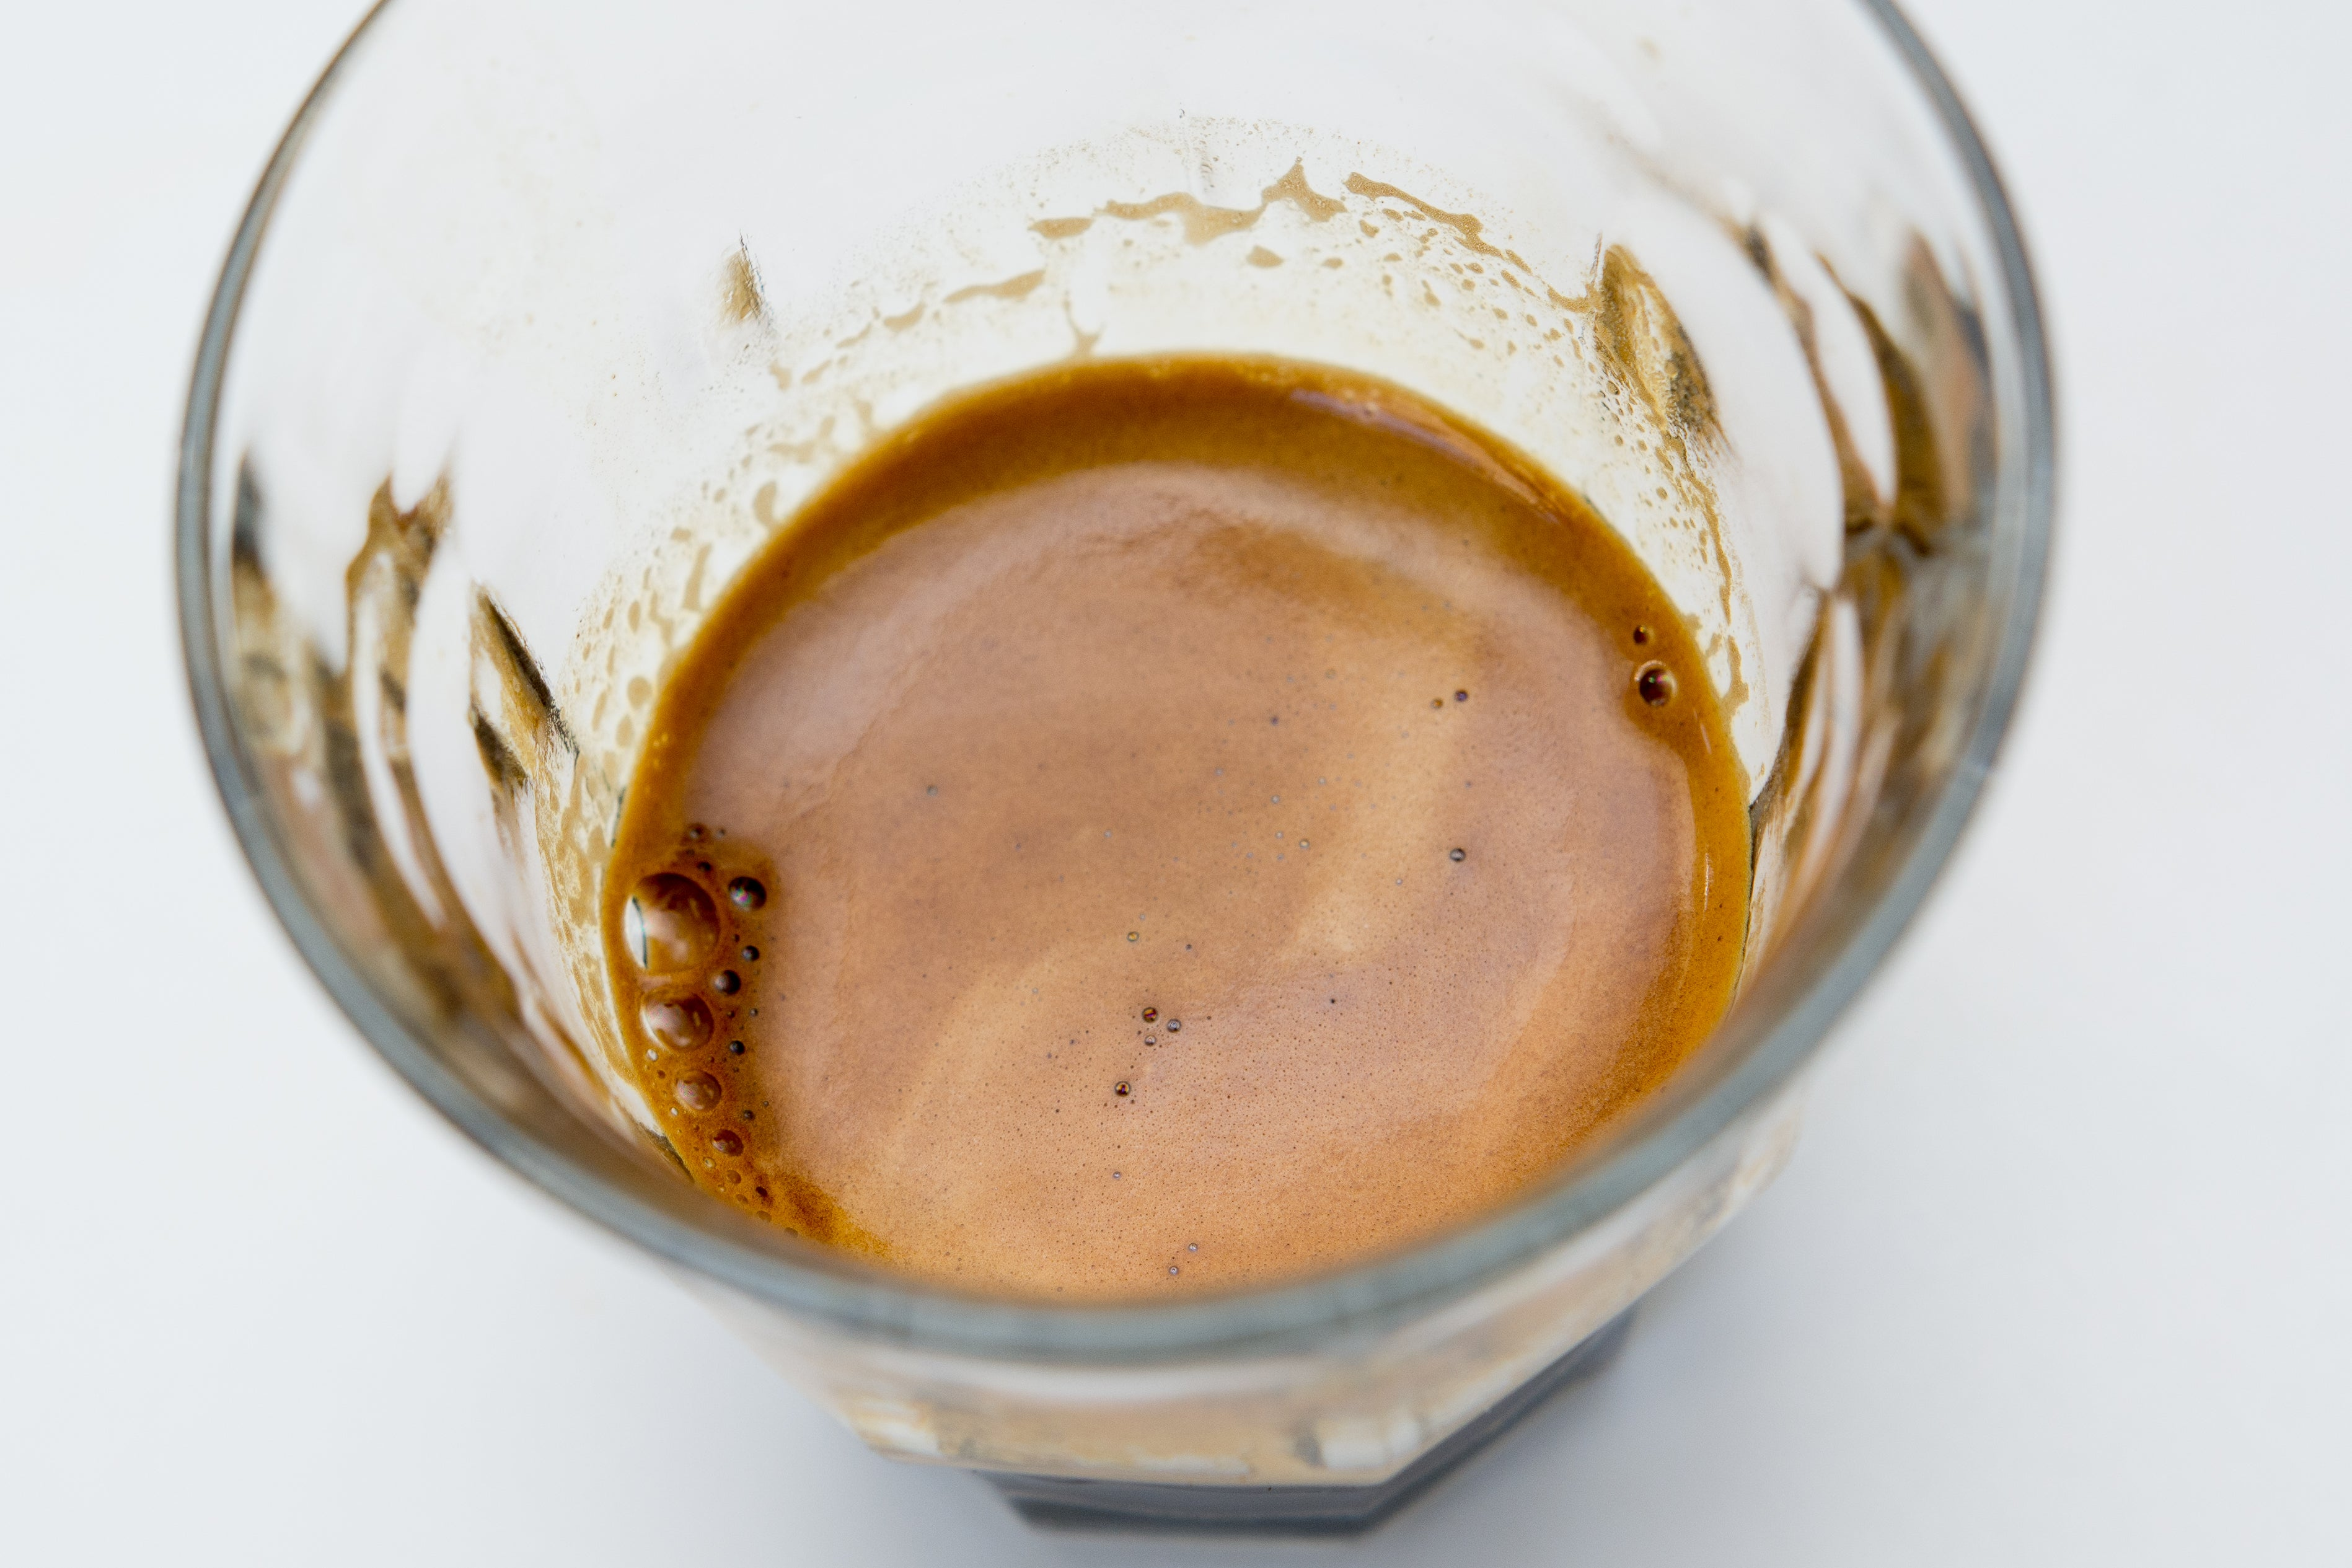 Coffee shot in glass